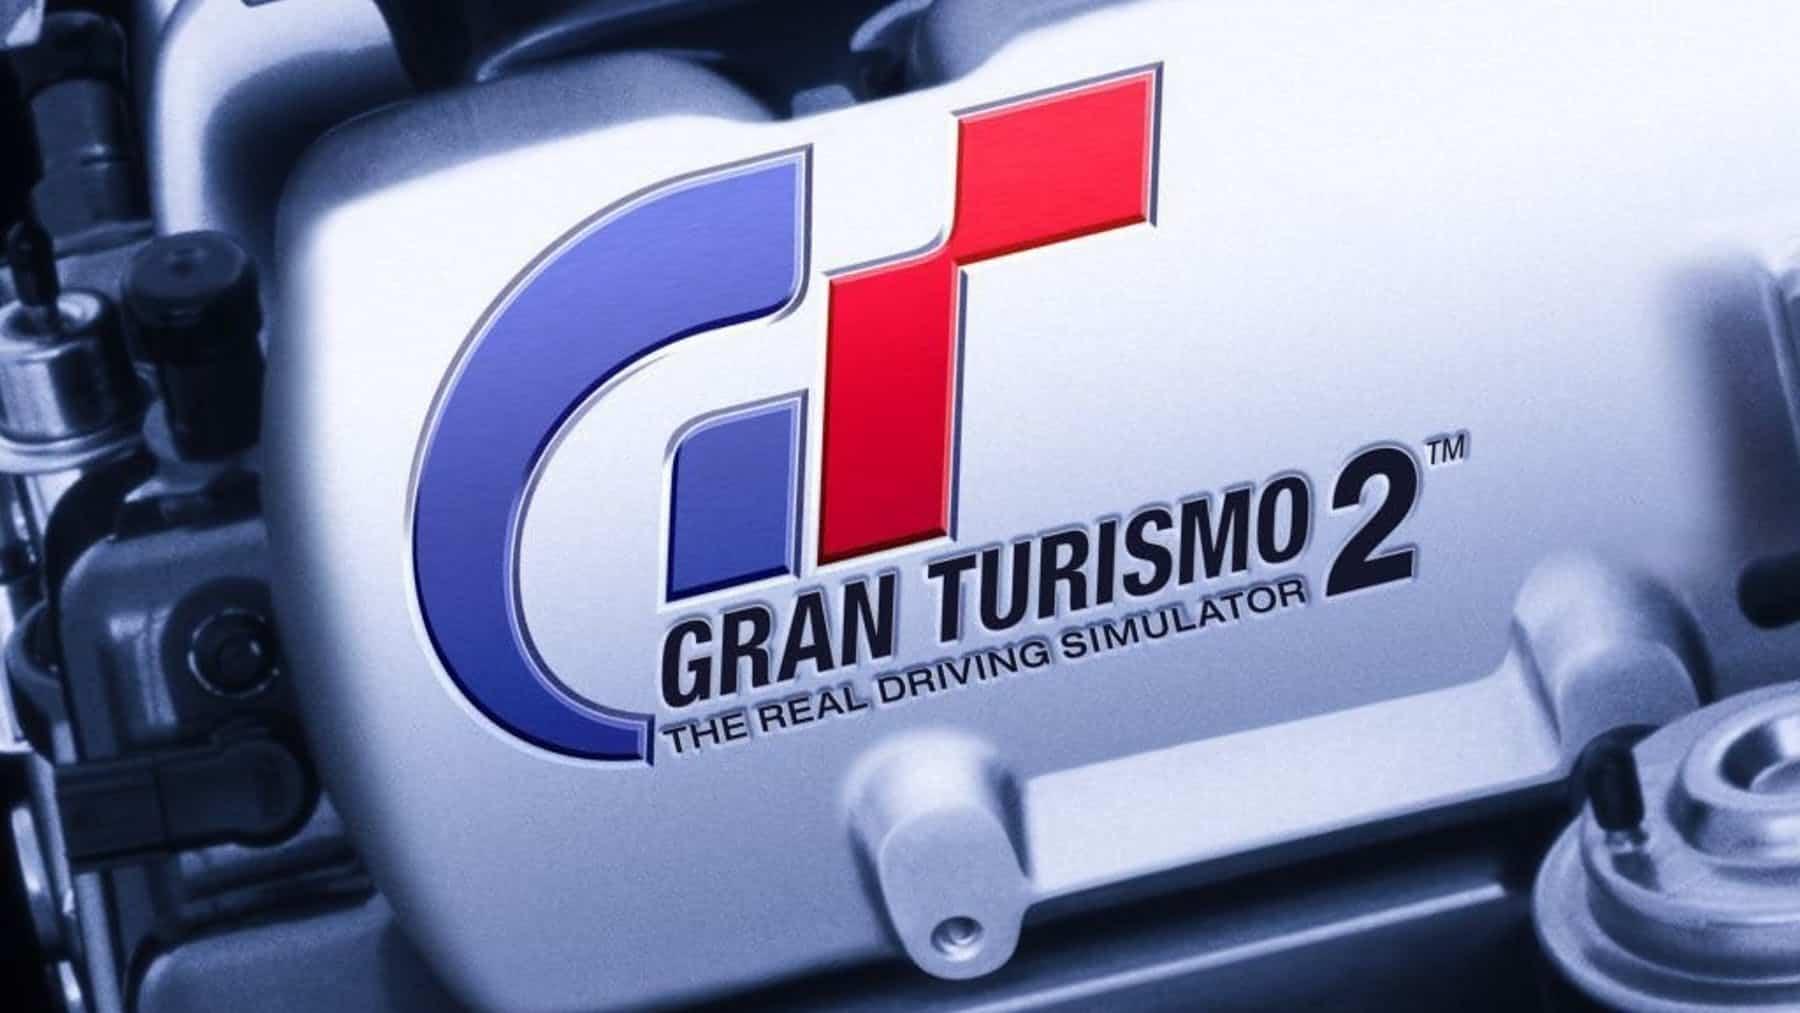 Best Racing Games - Gran Turismo 2